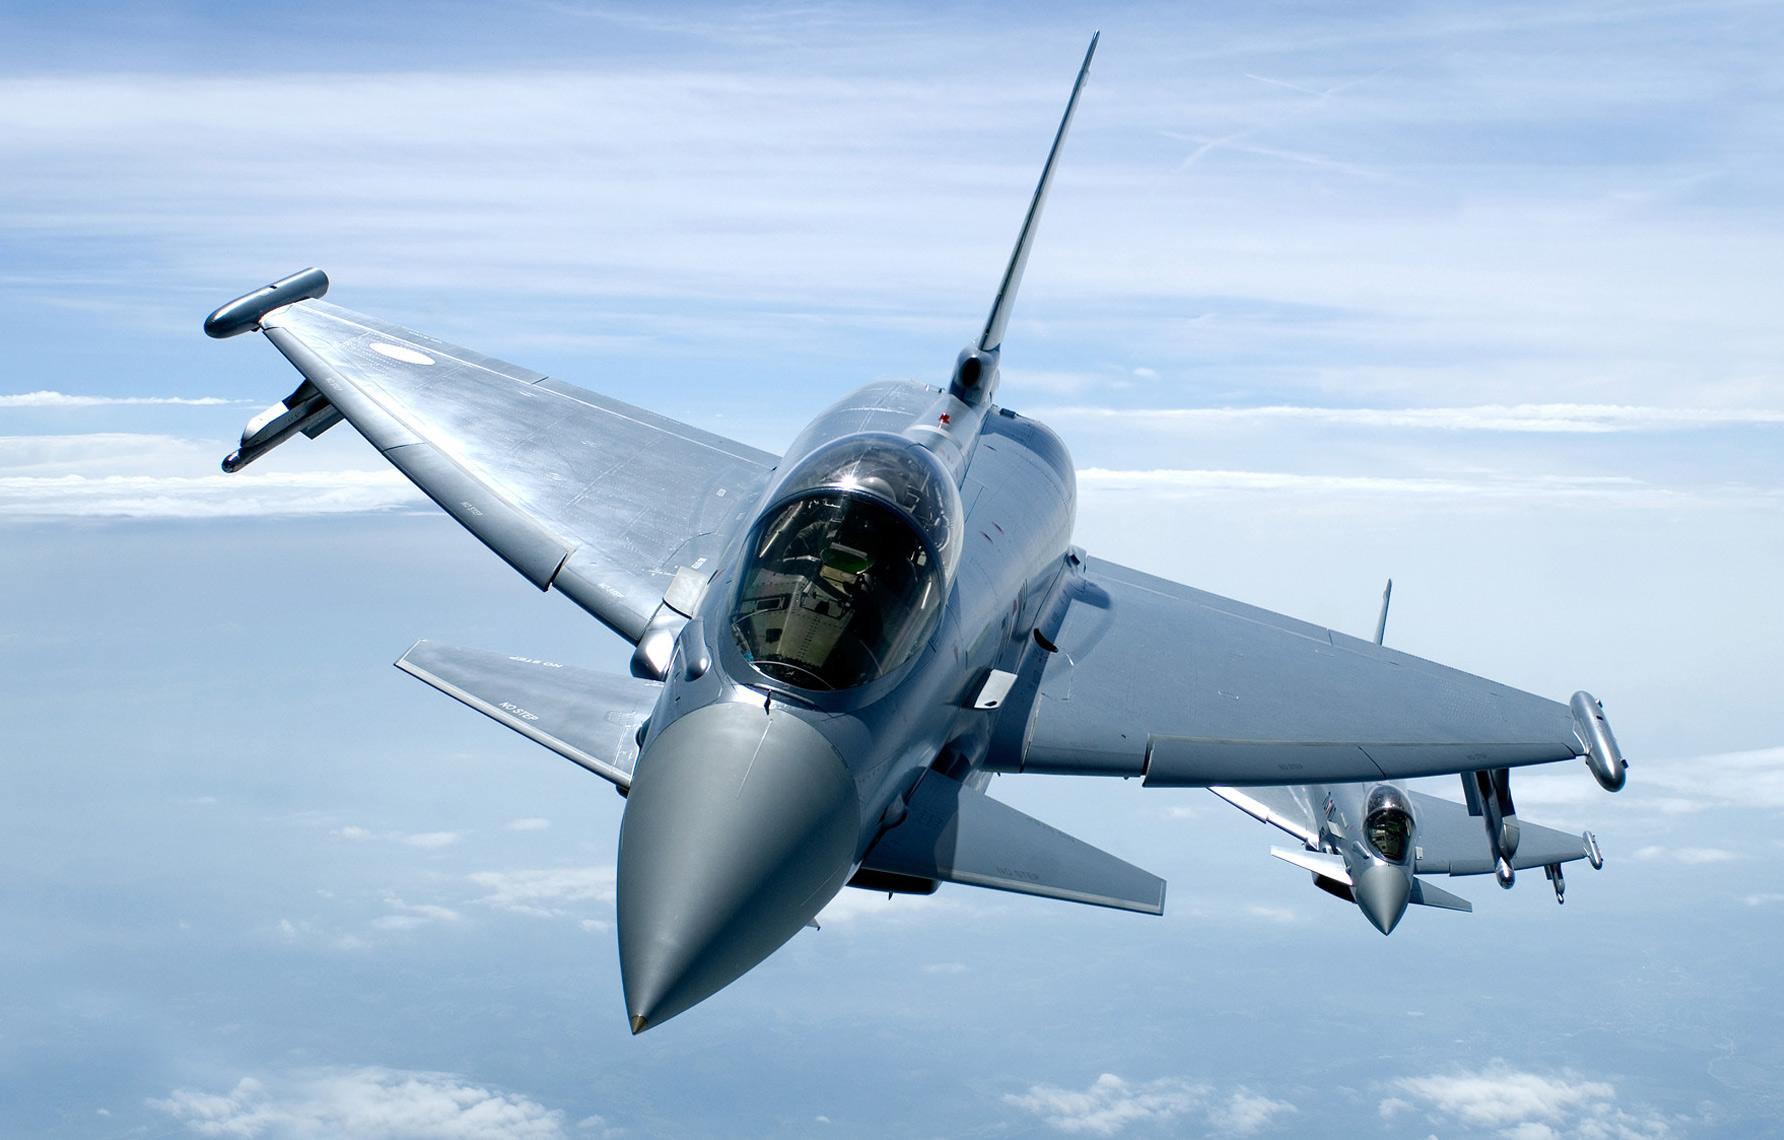 Manguera composite aviacion militar, queroseno, aceites minerales